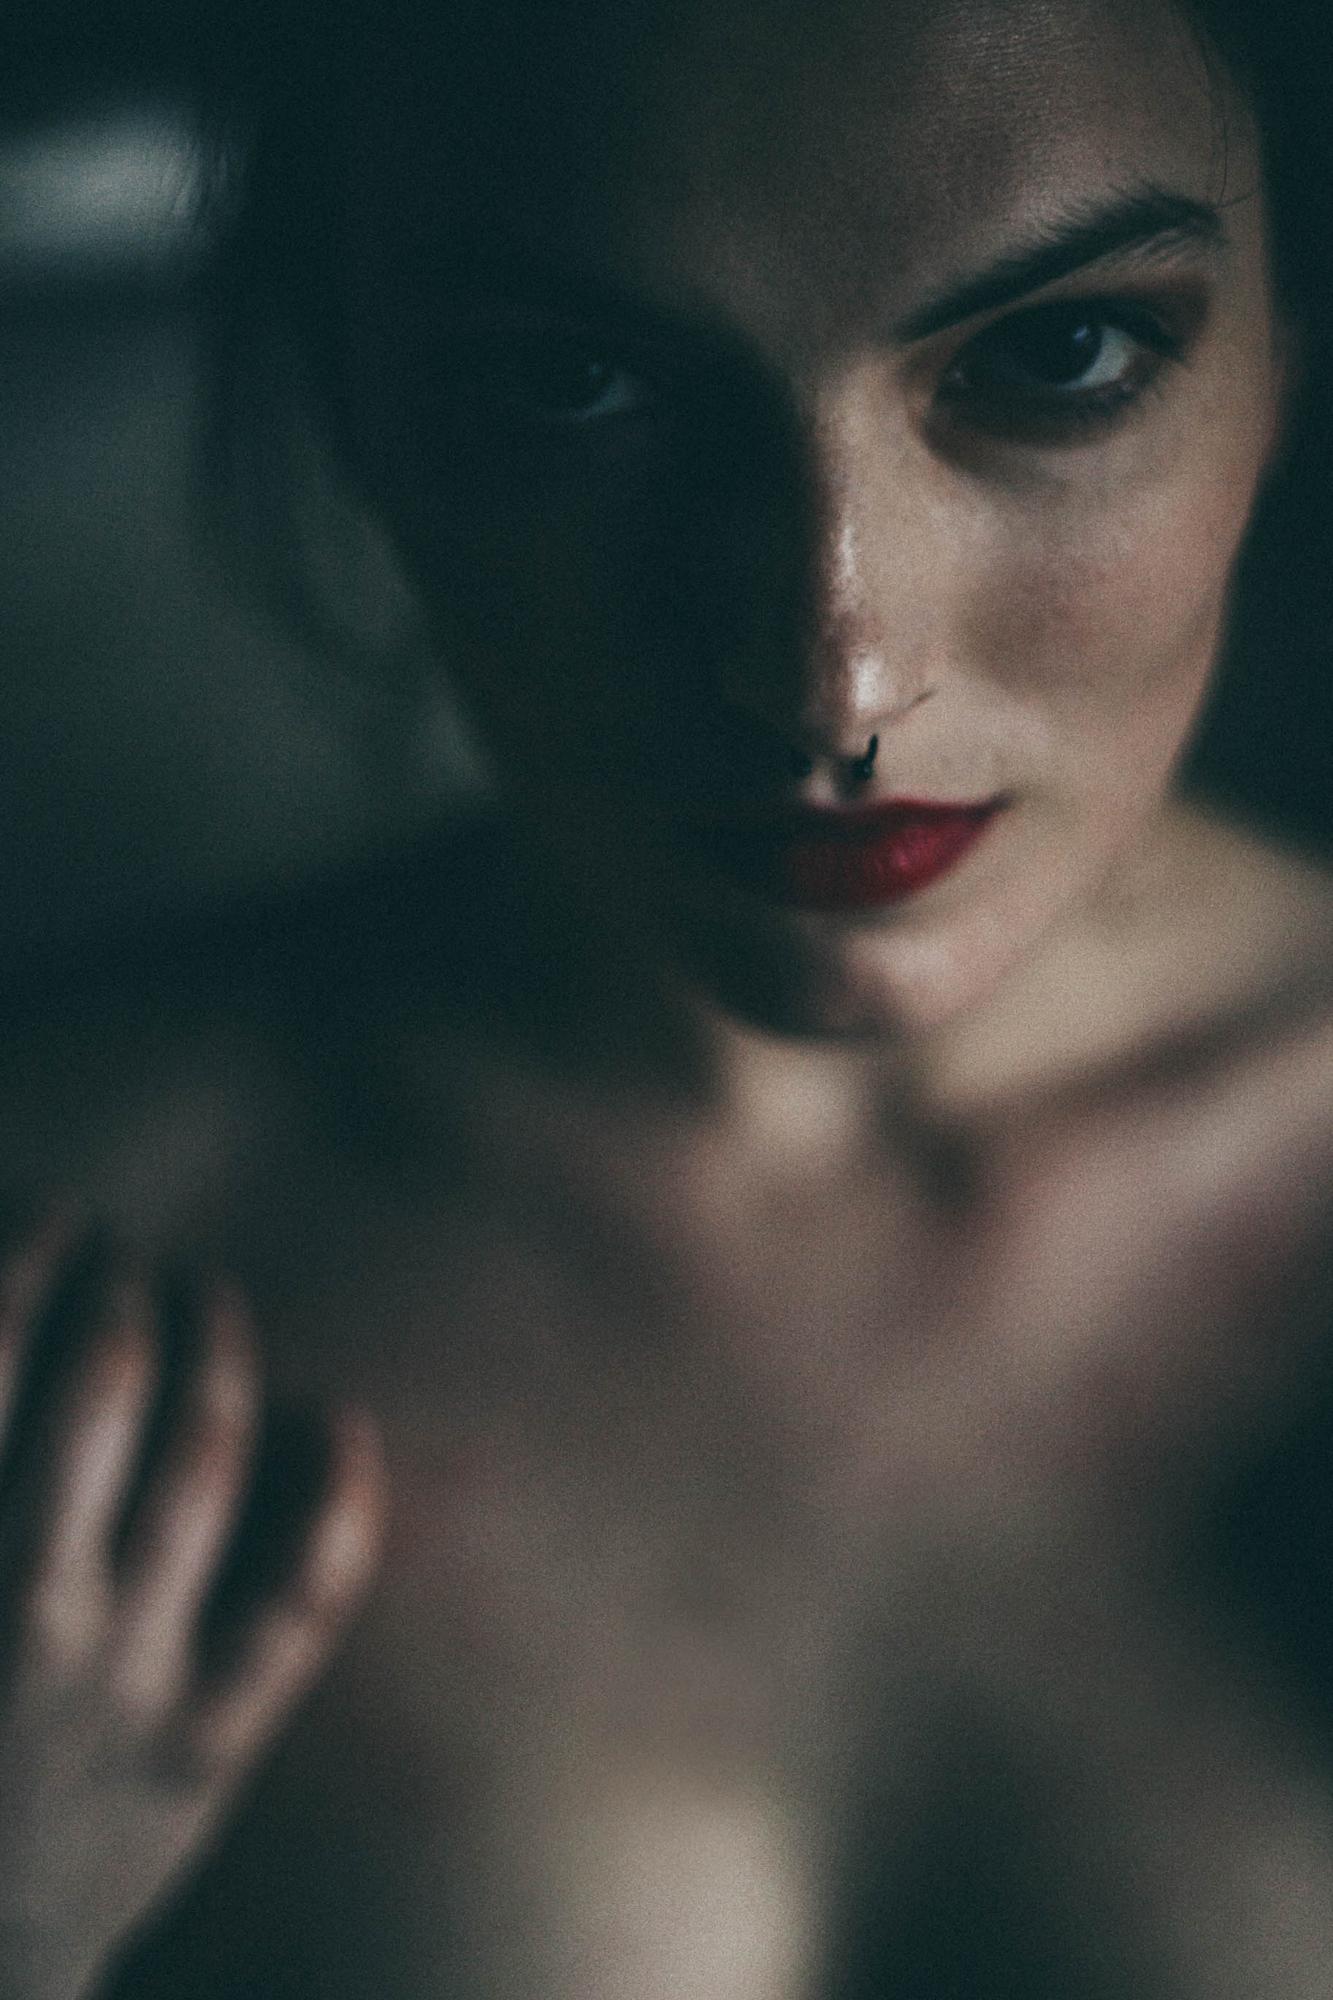 Gaz Harbuz (harbuzenger) - Sara Christy - makeup Cathy Entwisle (makeupbycathy1)